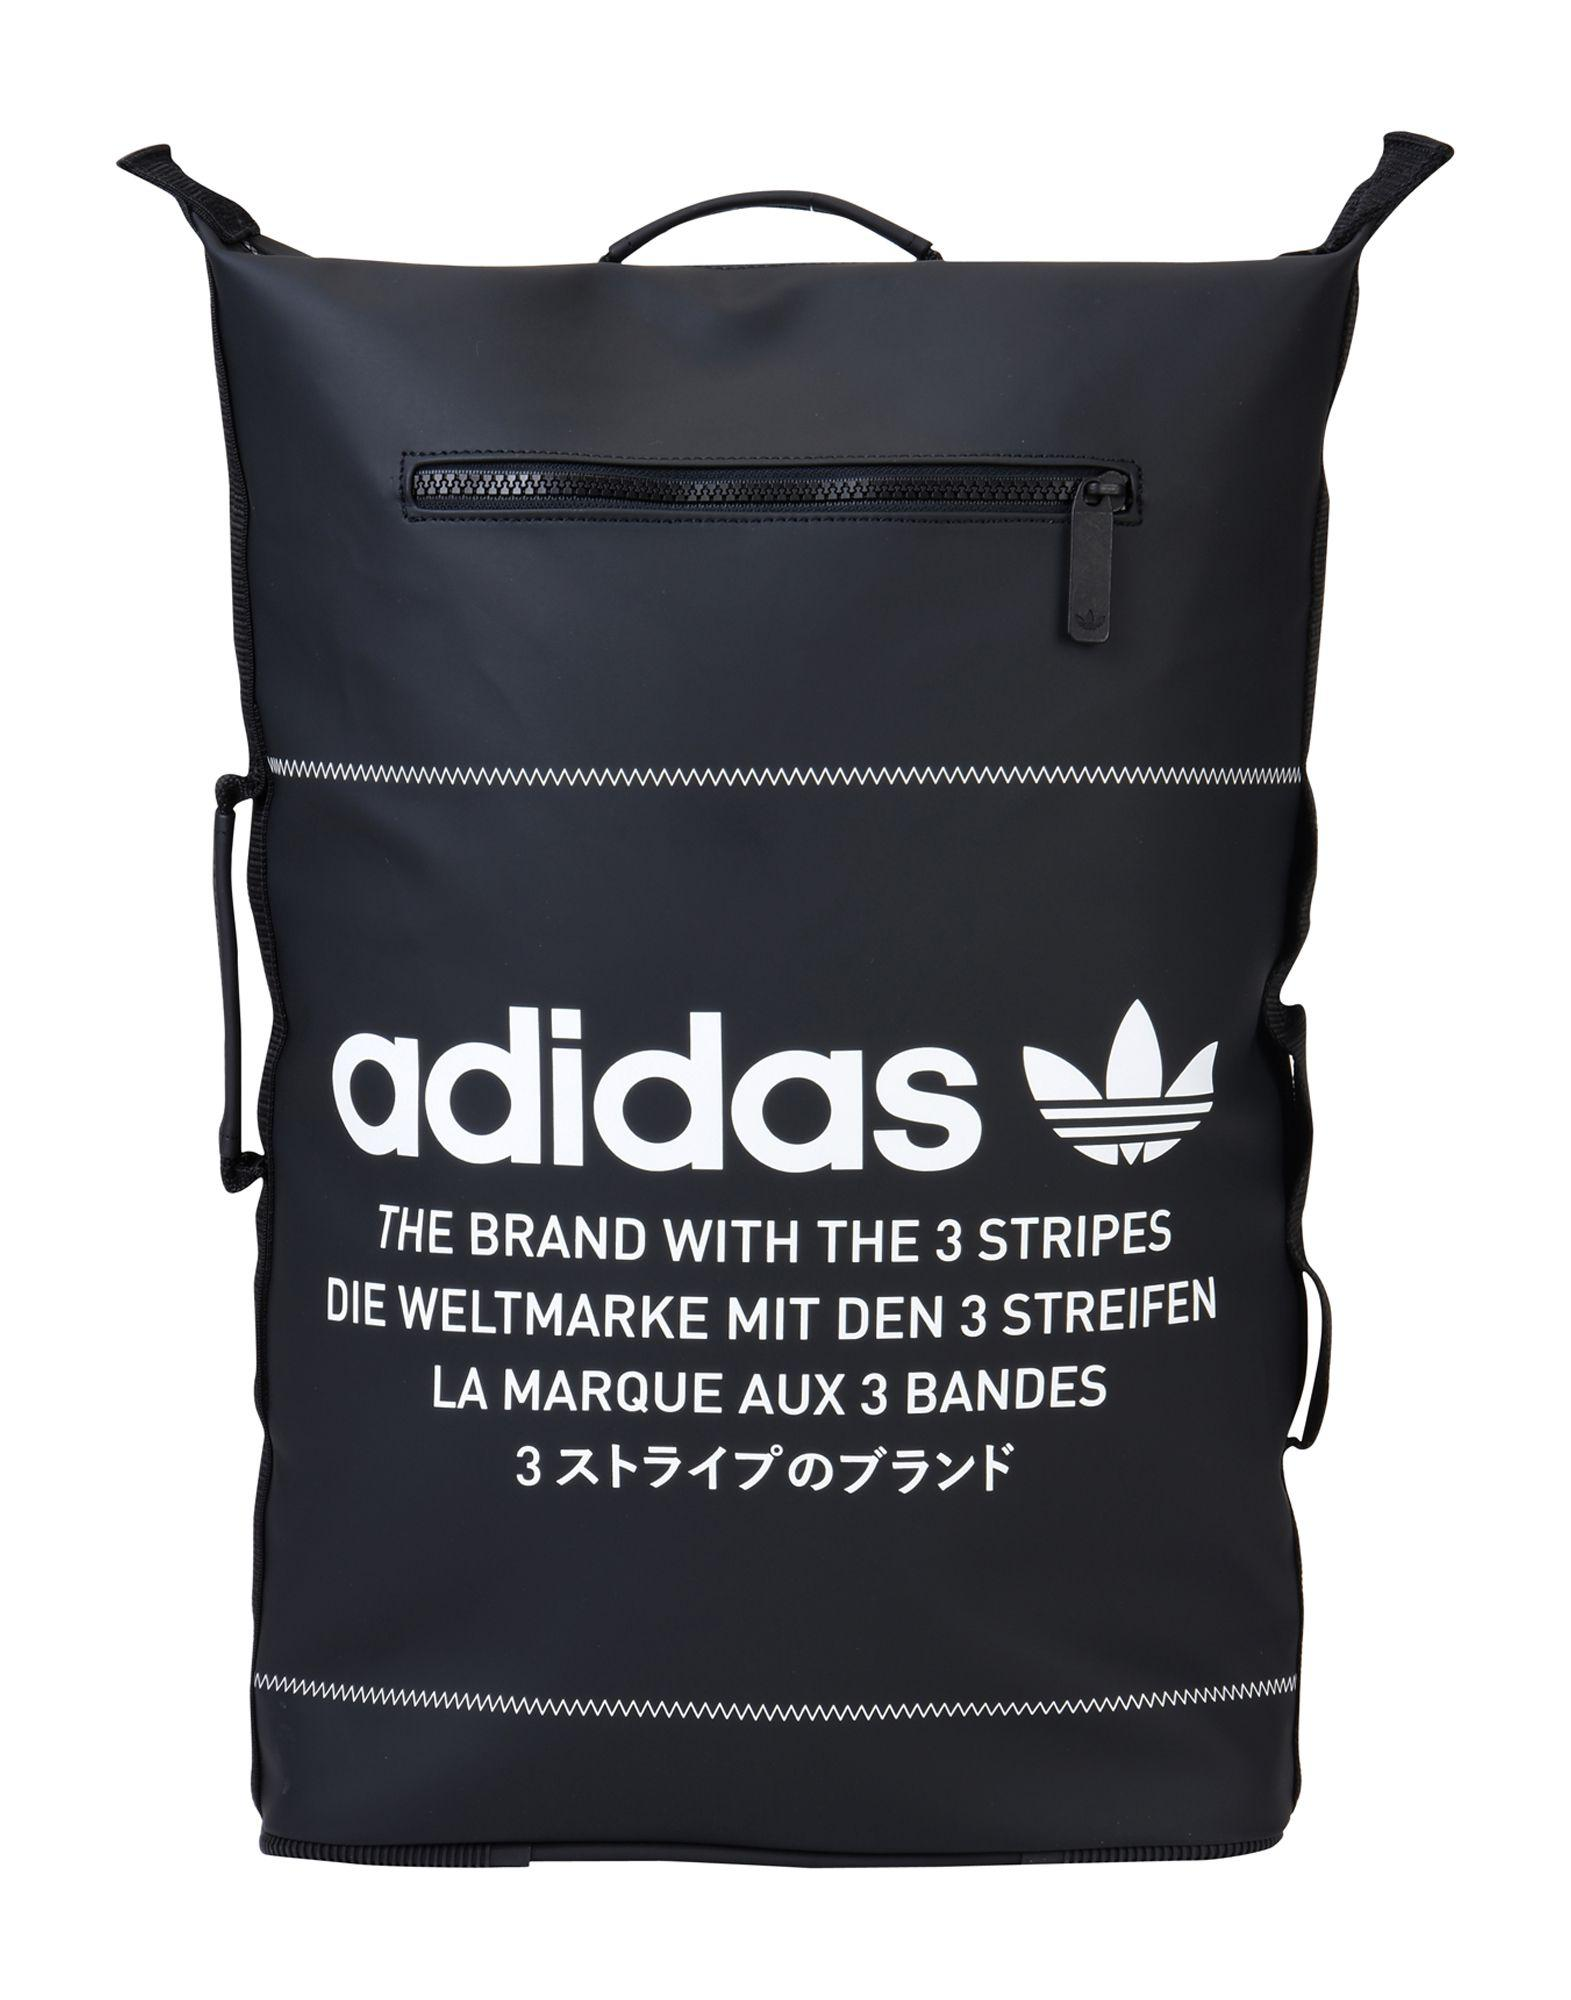 b880f05c76 adidas Originals Backpacks   Bum Bags in Black - Lyst